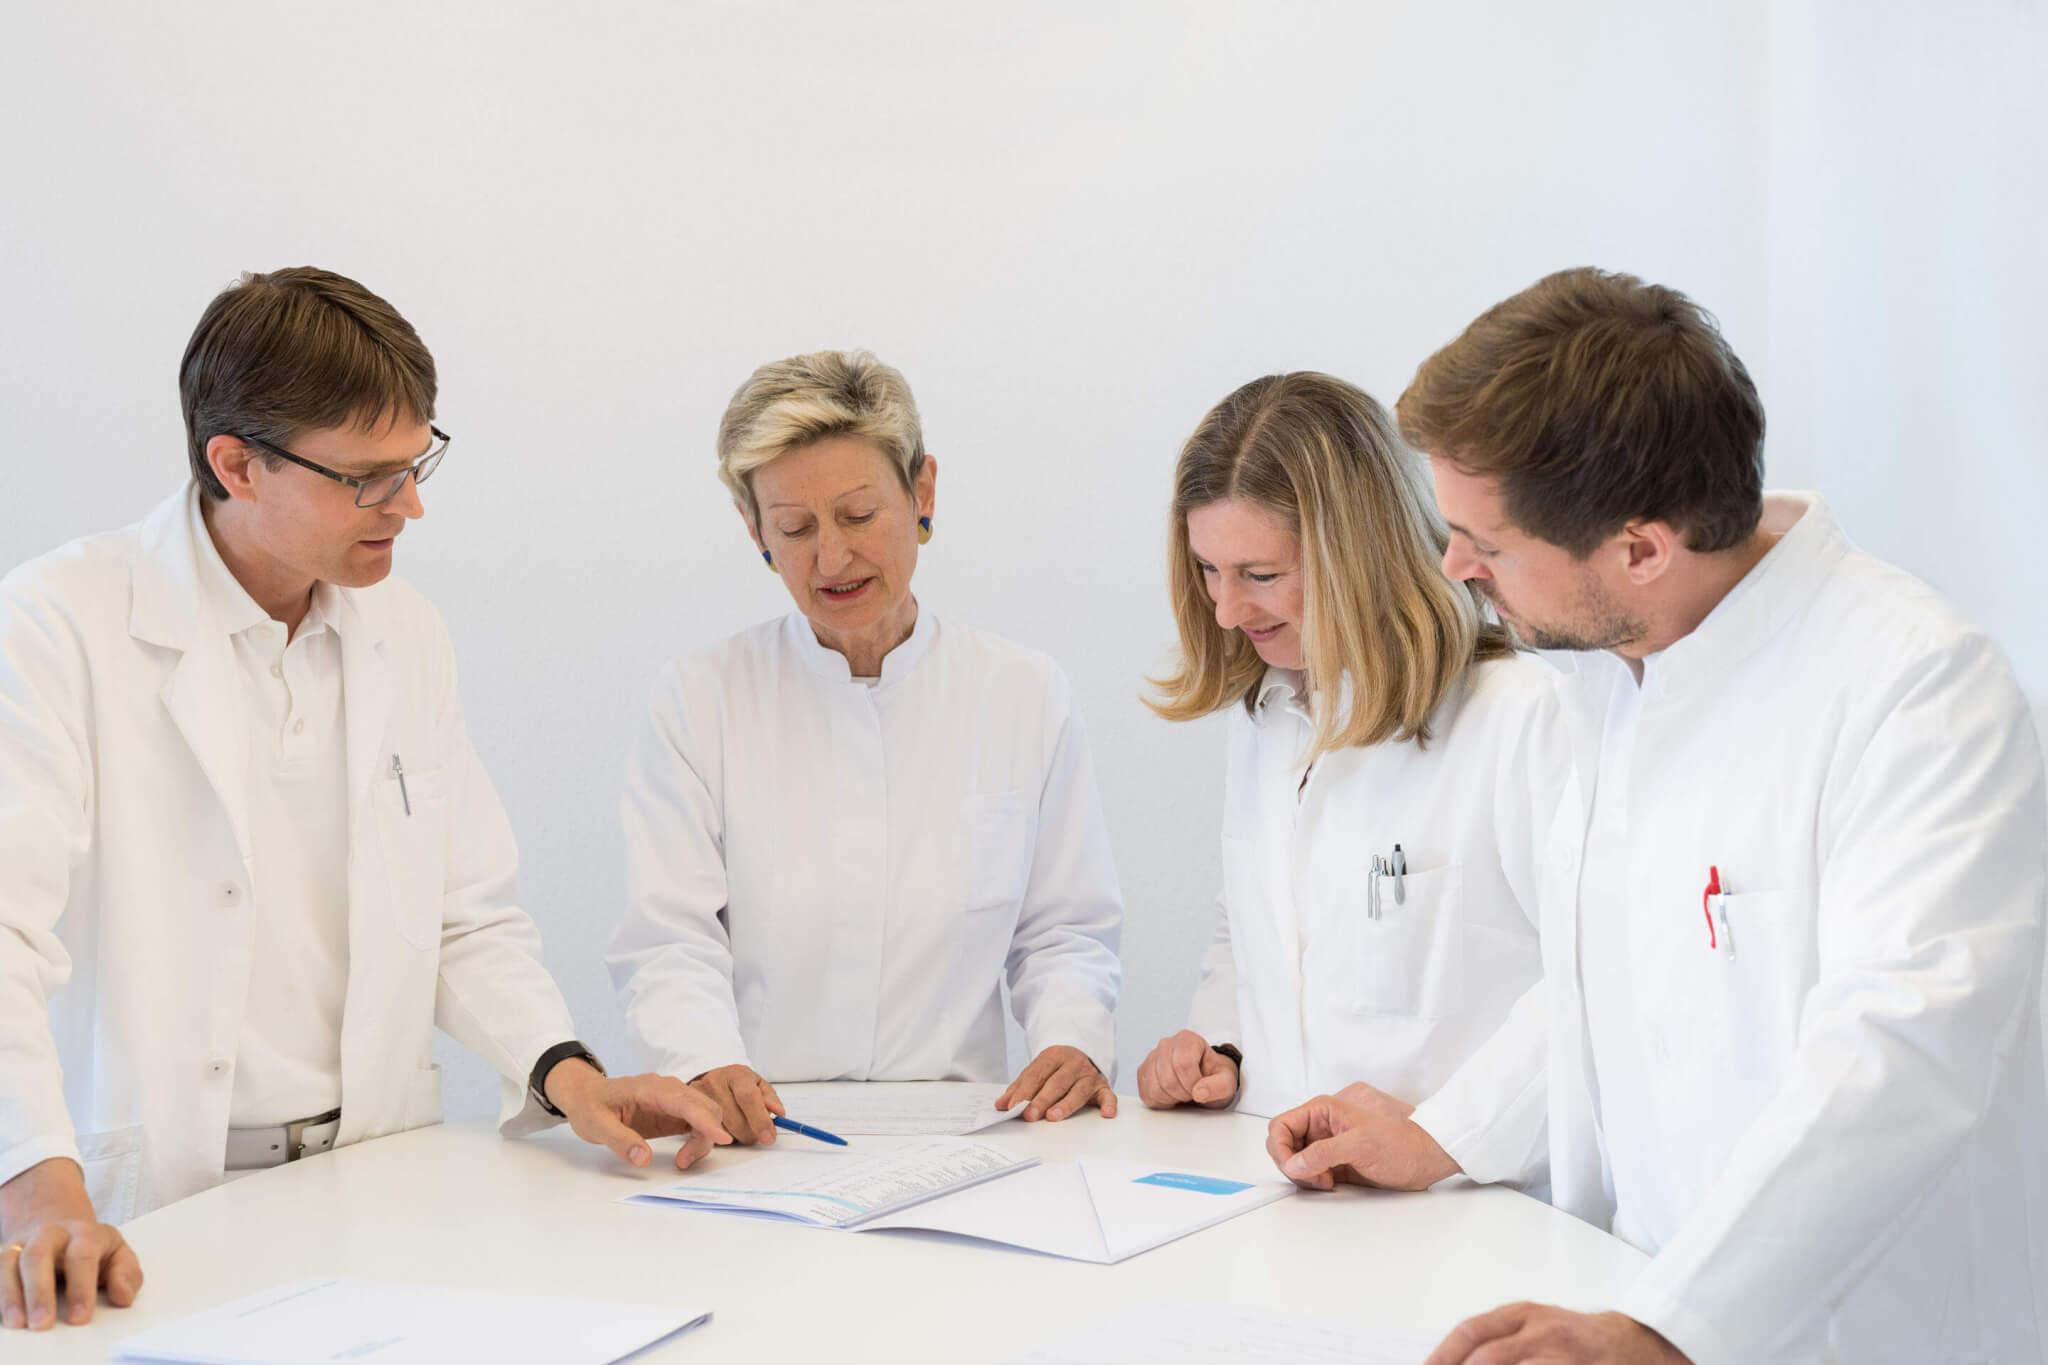 Buchinger Wilhelmi, Fasten, Heilfasten, Fasting, Health,Medicina integrativa, ayuno, salud, Integrative Medicine, Ärzte, Doctors, Meeting, Besprechung,